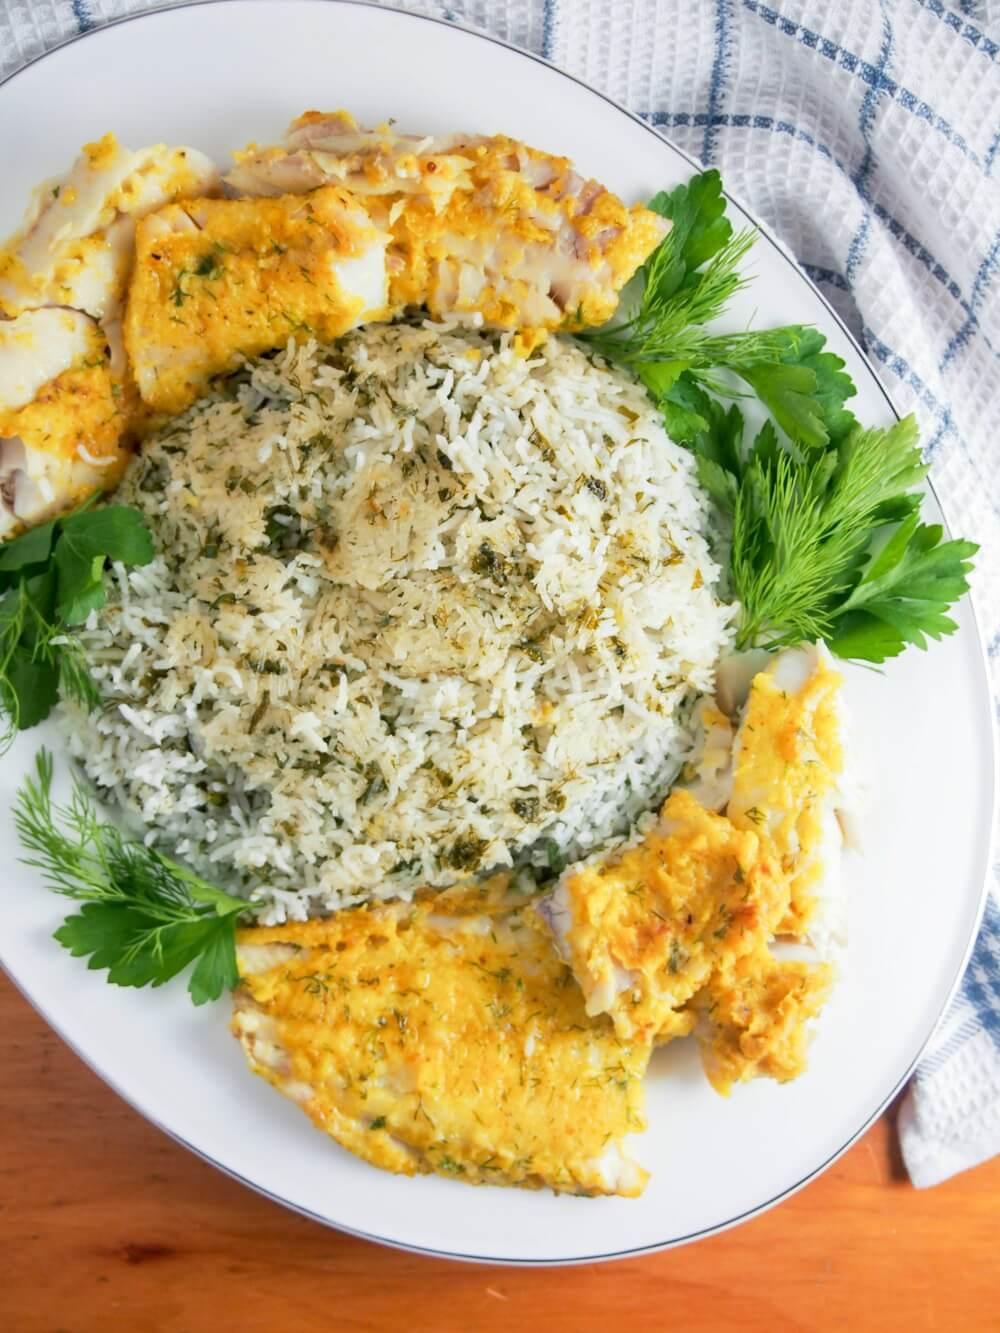 Persian herb rice with fish - sabzi polow mahi